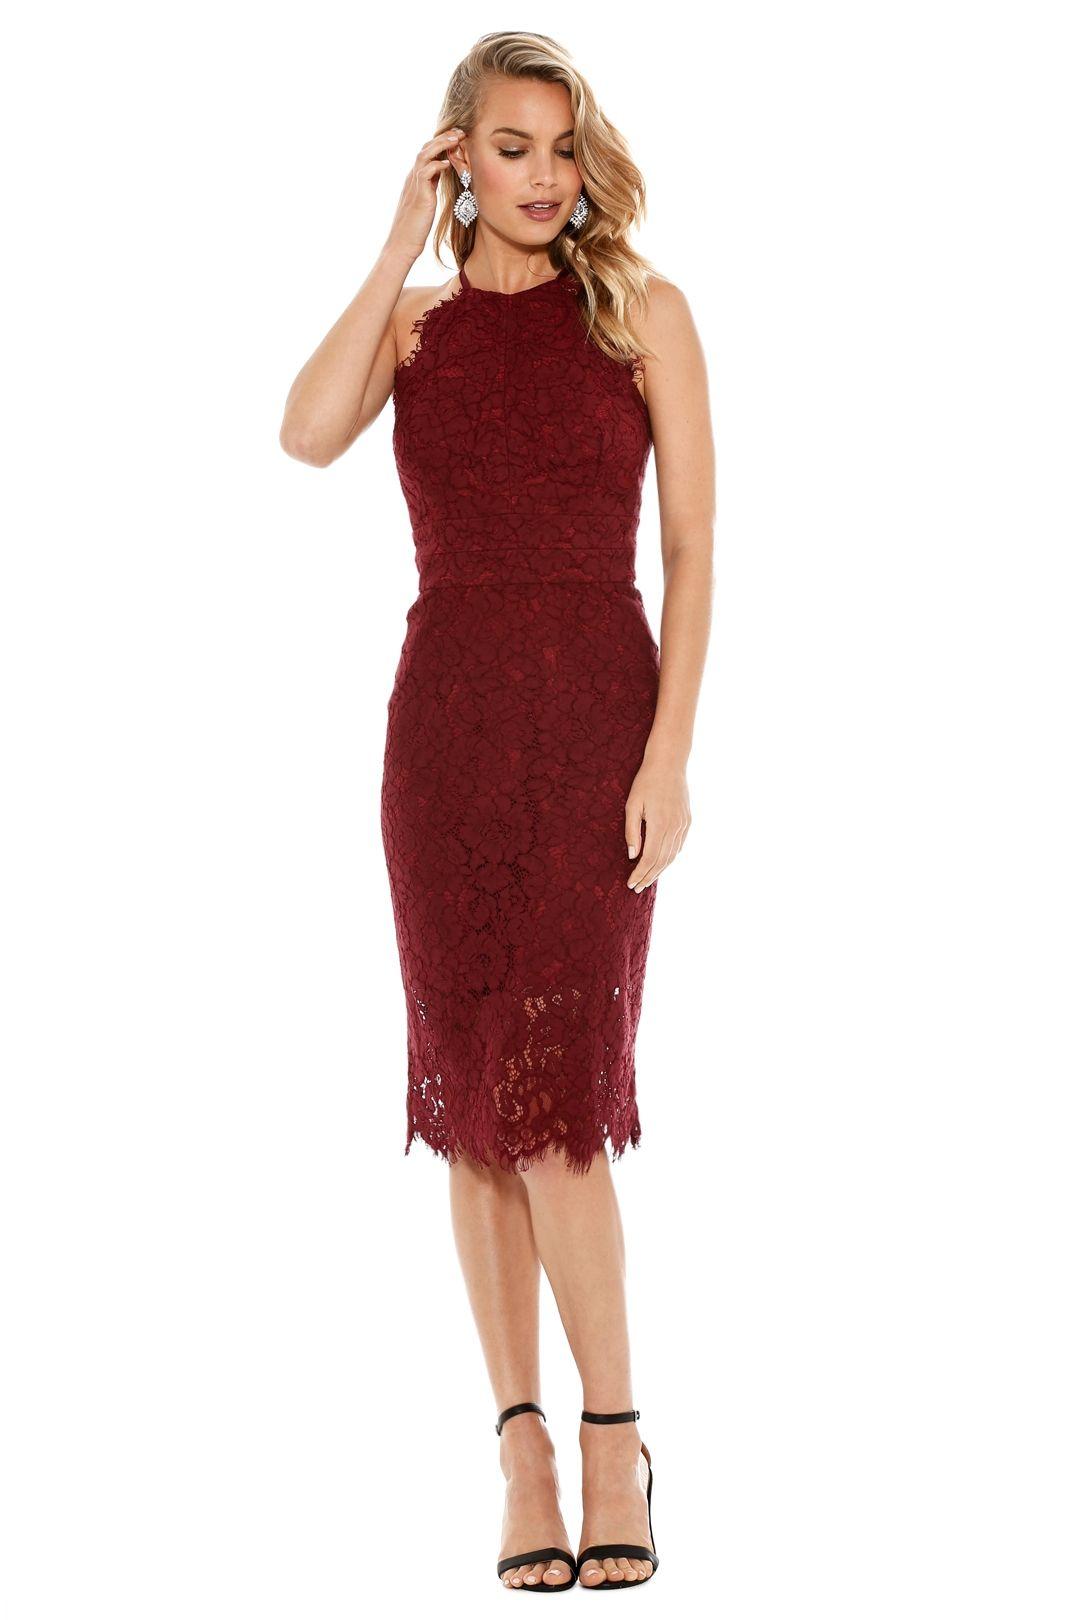 Lover - Ruby Oasis Halter Dress - Red - Front